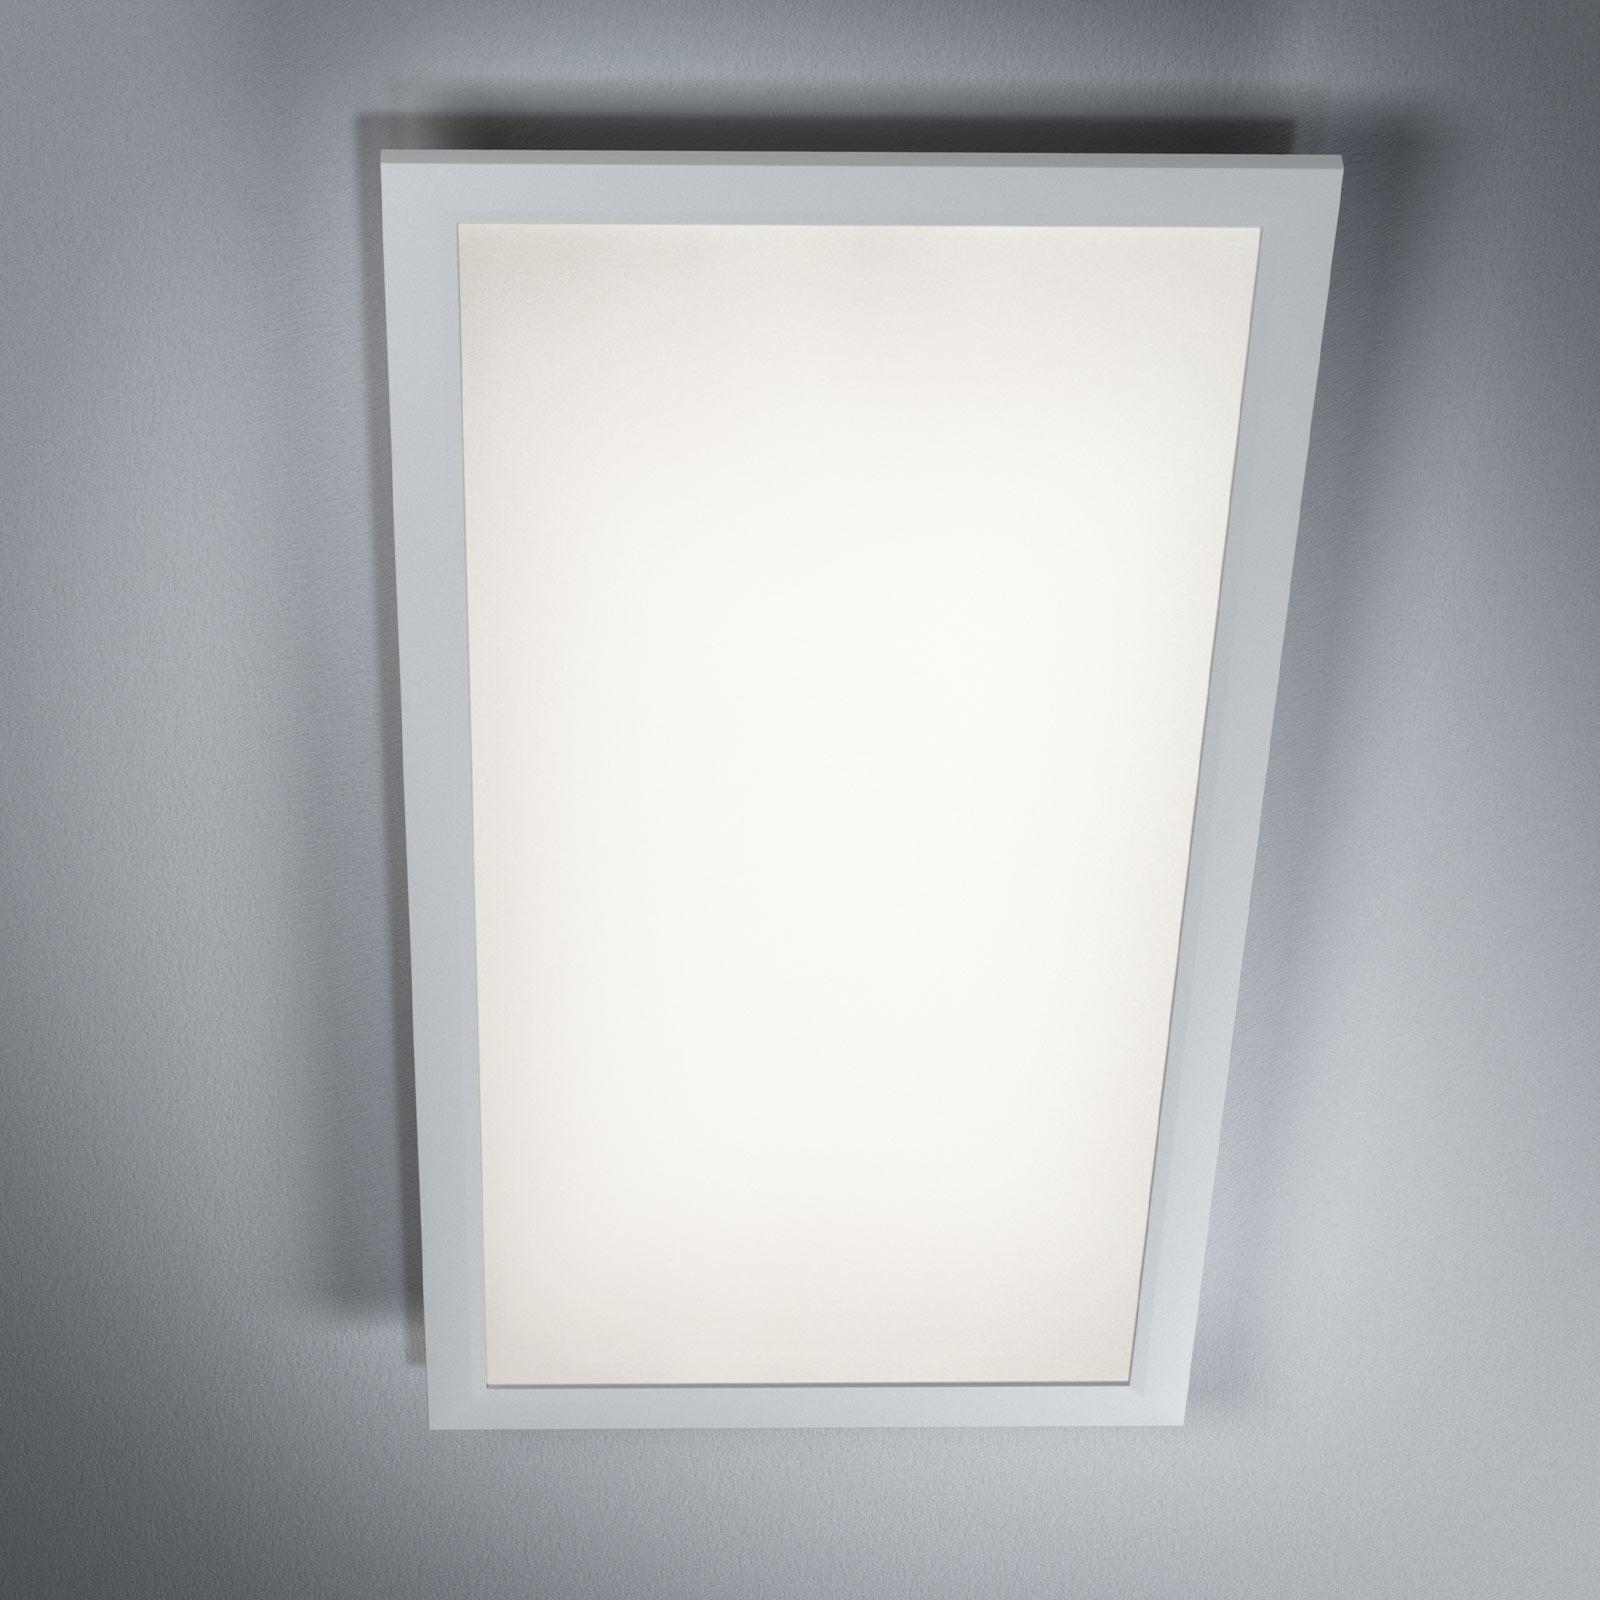 LEDVANCE Planon Plus LED-paneeli 60x30cm 830 15W